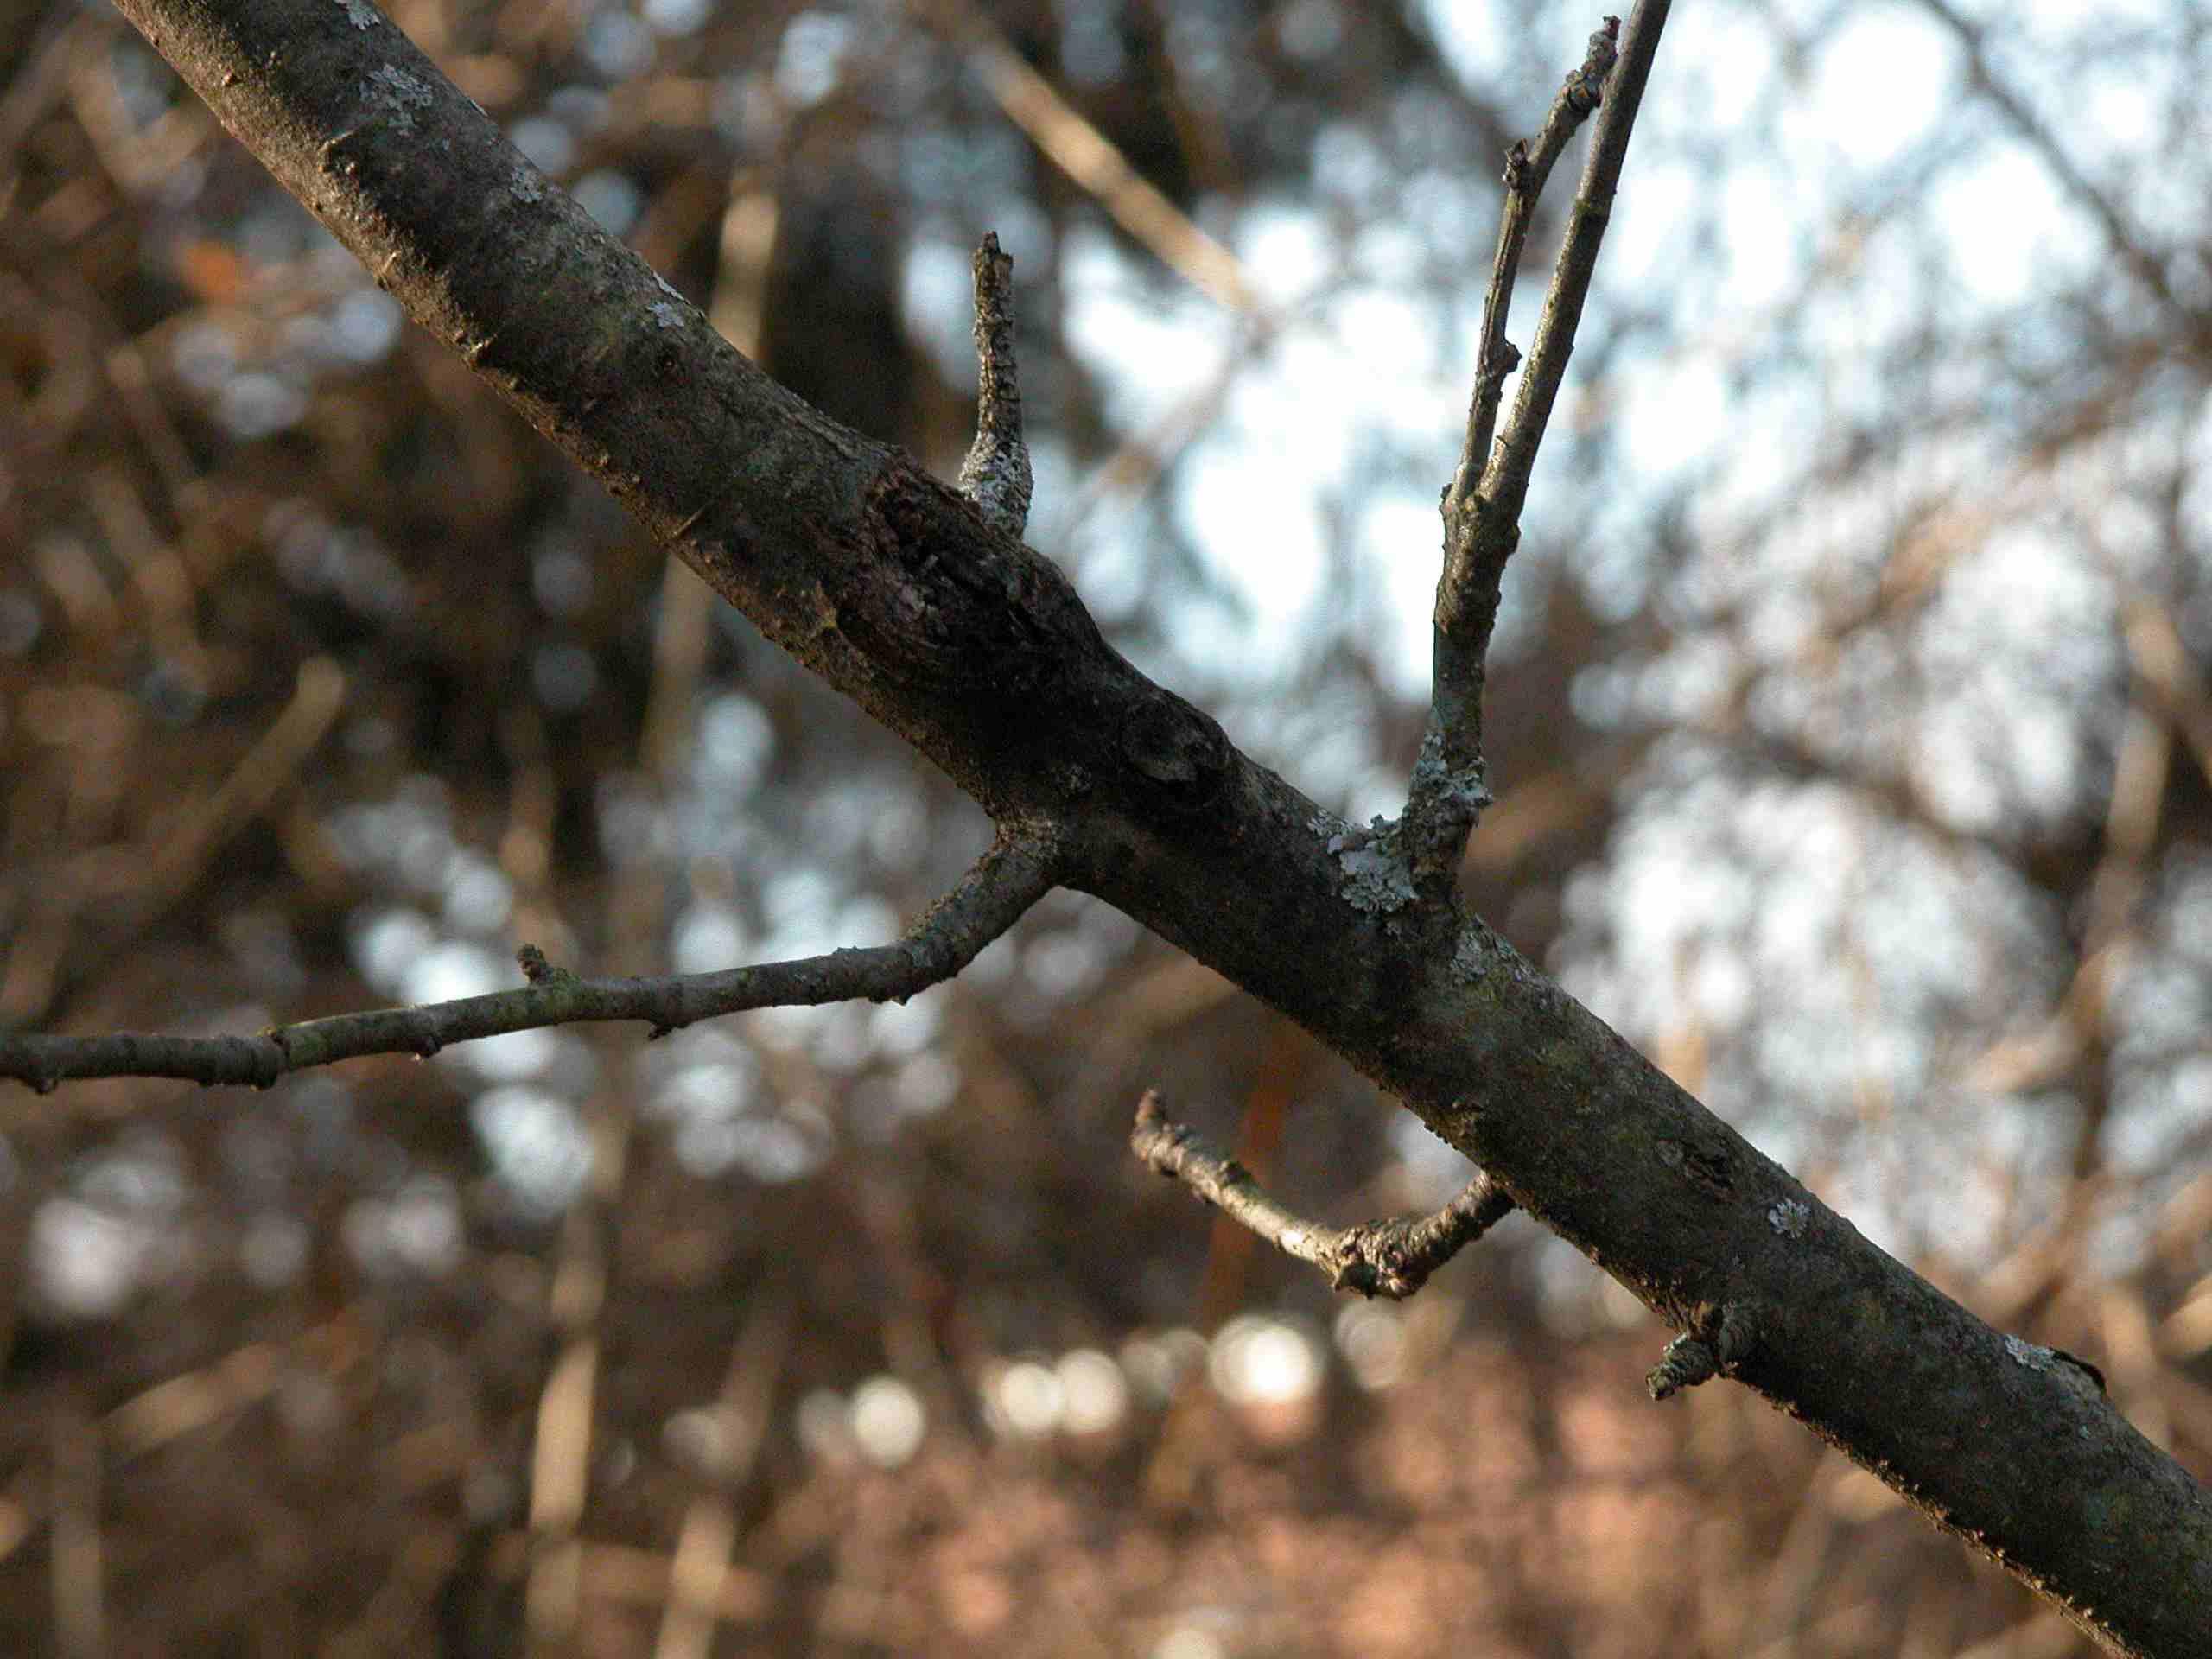 Apple Tree Pruning - Removing Dead and Diseased Wood